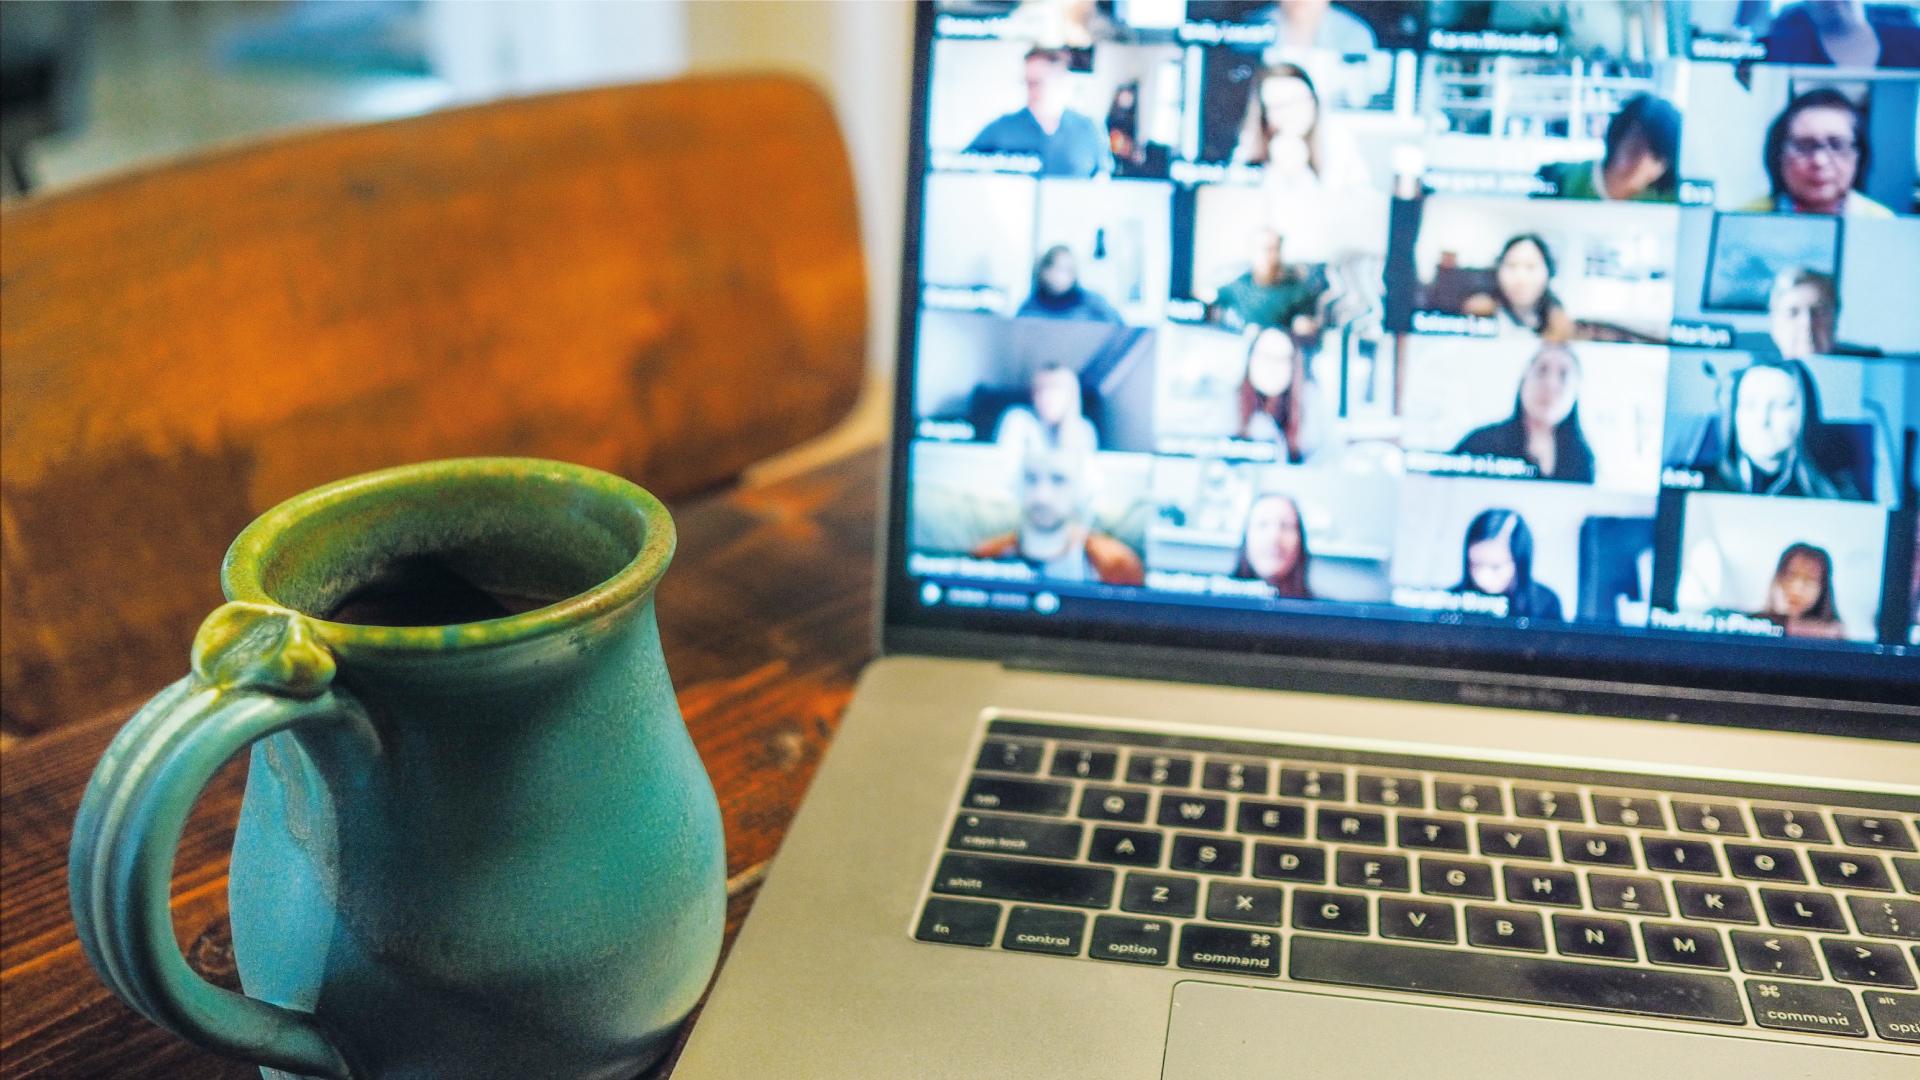 laptop coffee table mug facetime zoom virtually connect language program exchange